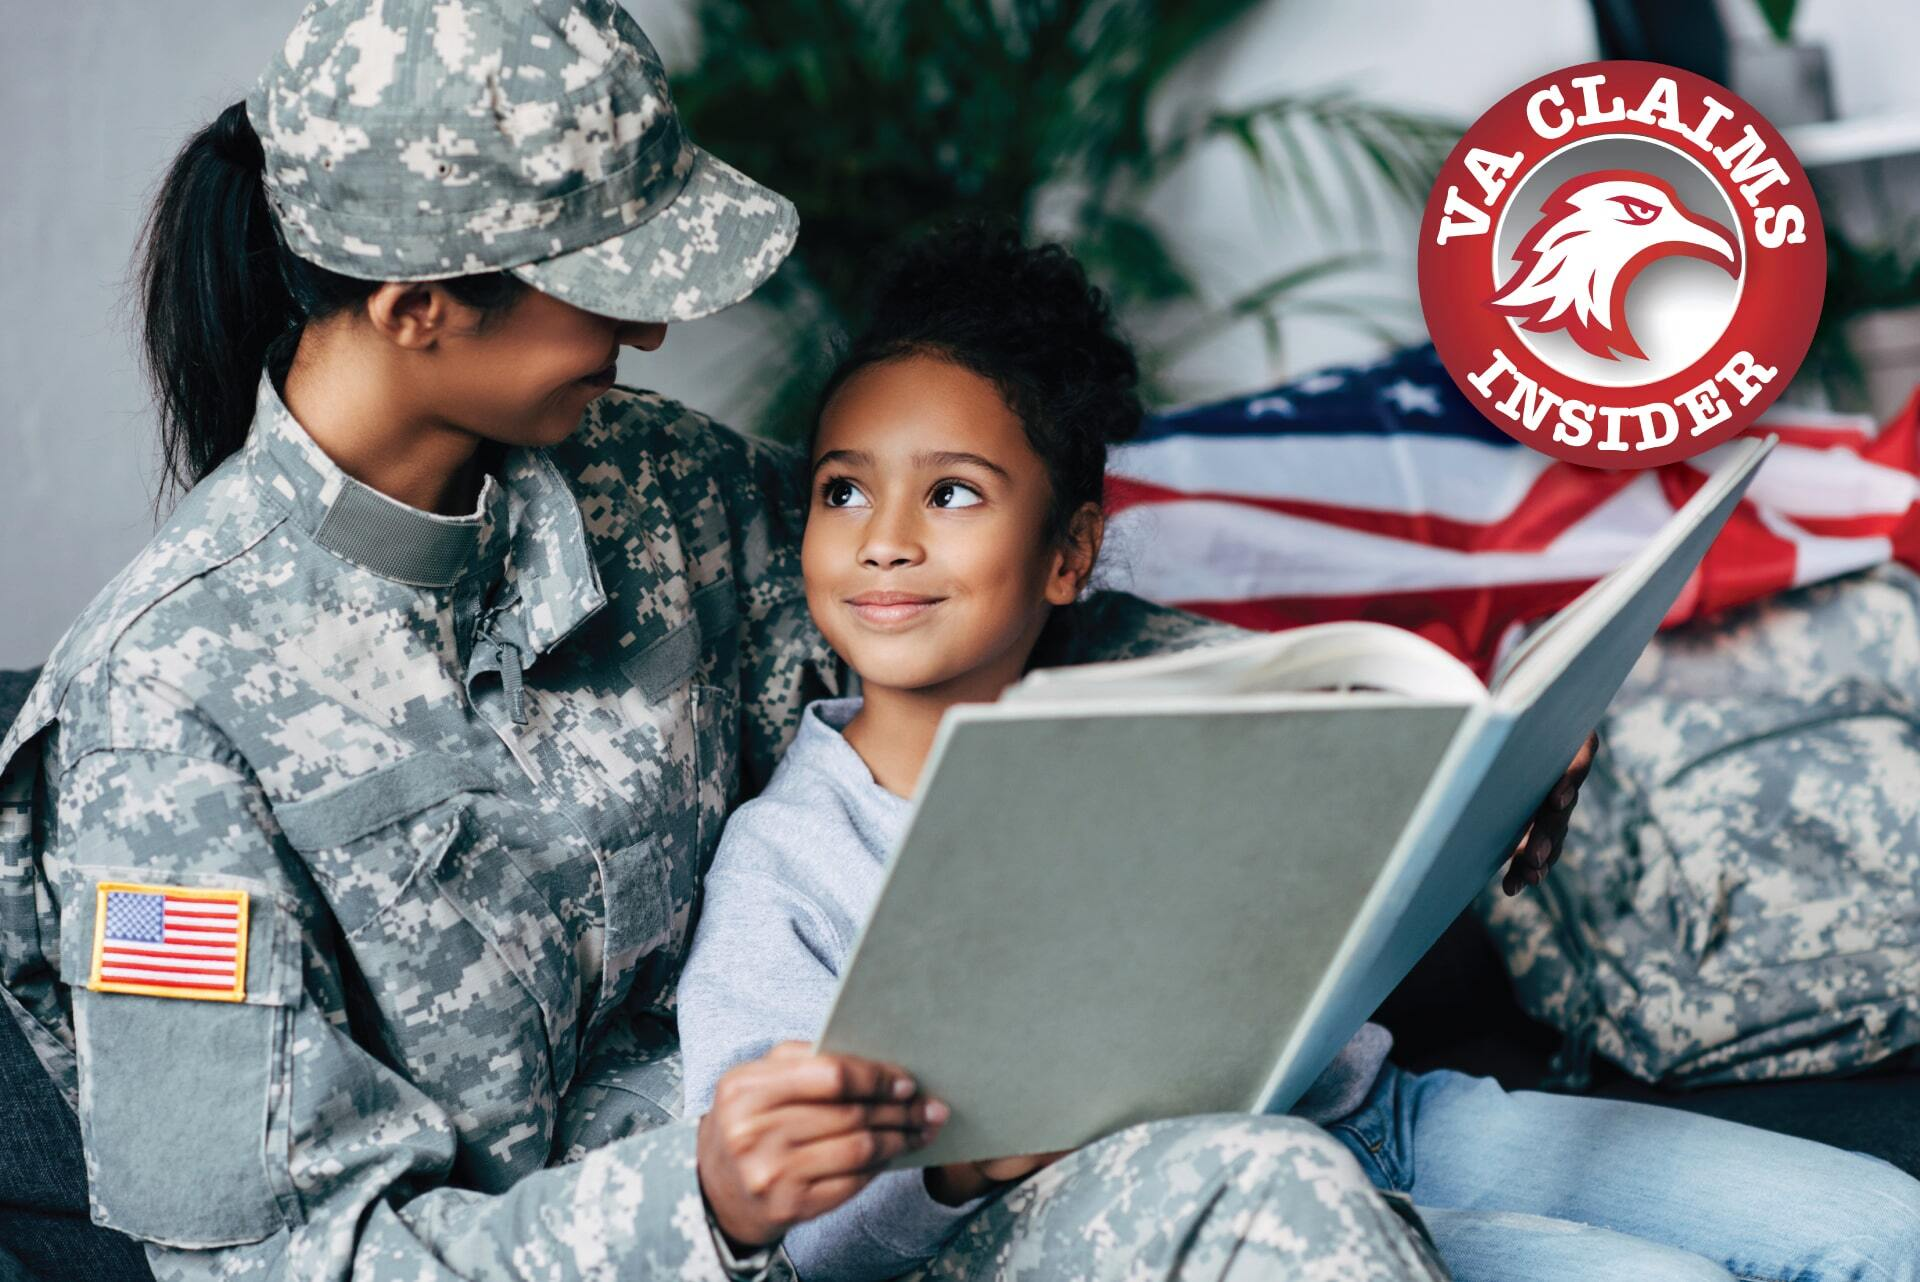 Education and Scholarships Veteran Charities